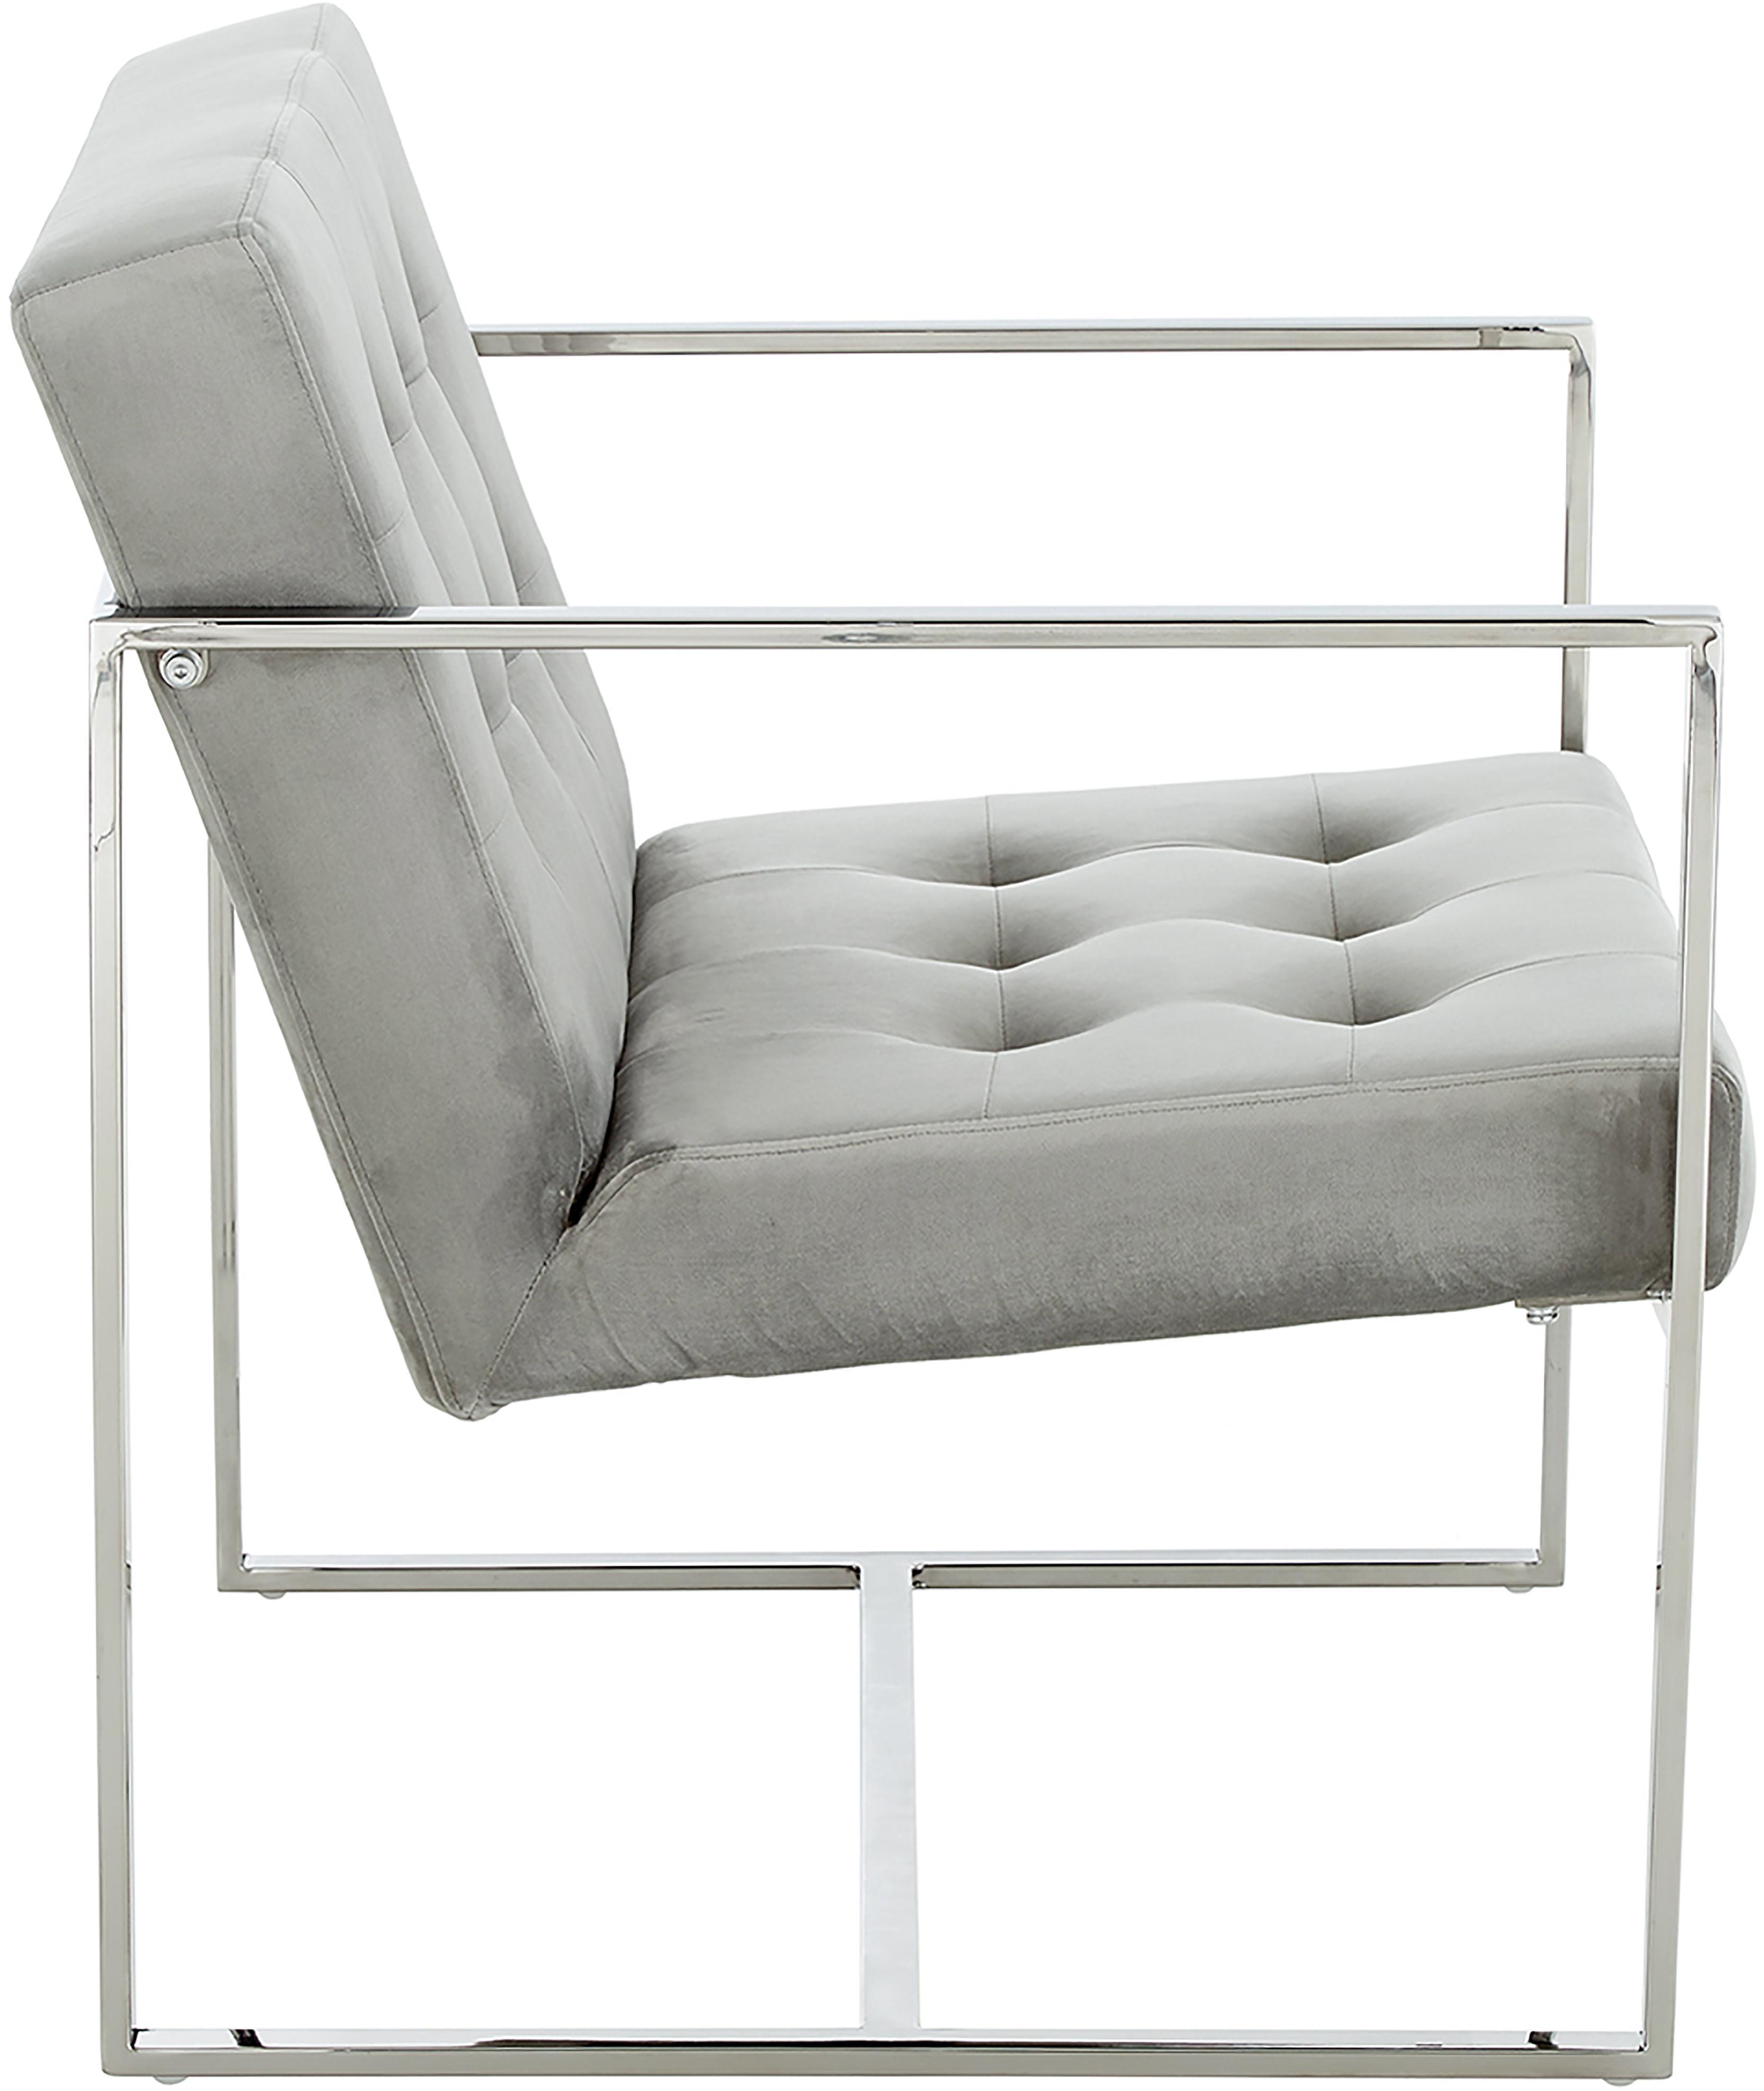 Samt-Loungesessel Manhattan in Grau, Bezug: Samt (Polyester) 30.000 S, Gestell: Metall, galvanisiert, Samt Grau, 70 x 79 cm